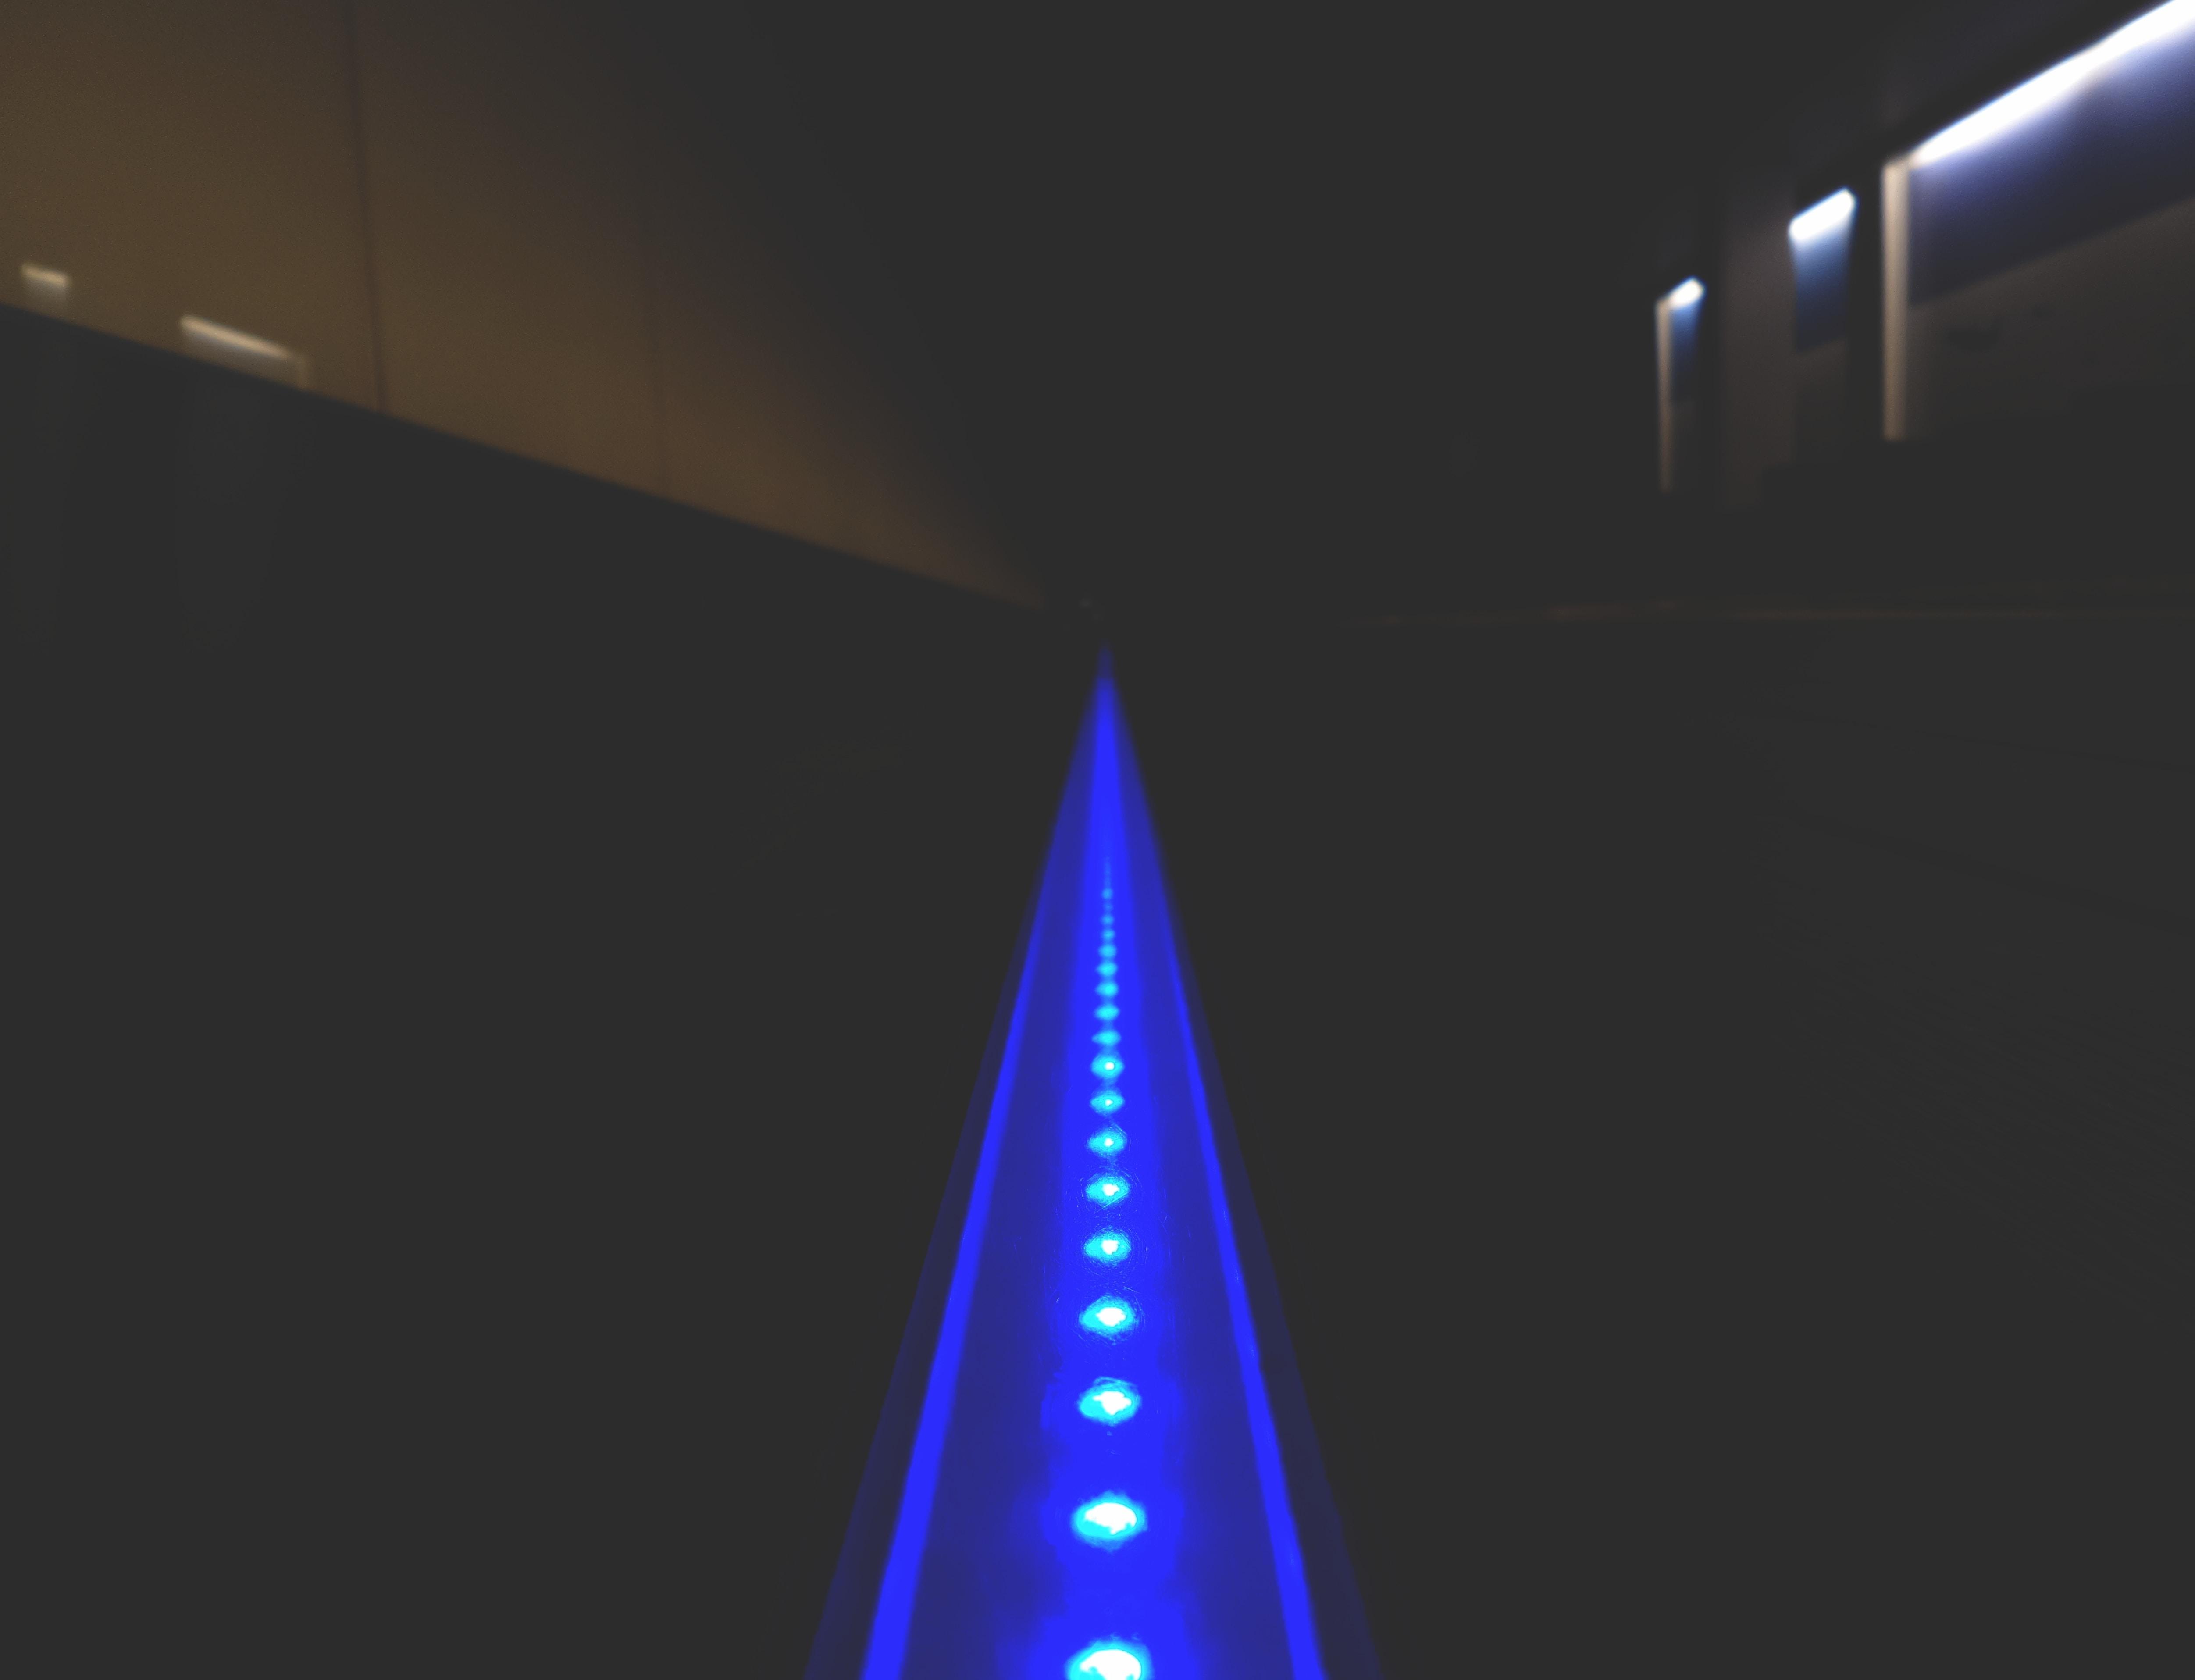 Montaż taśmy LED na półce kartonowo-gipsowej